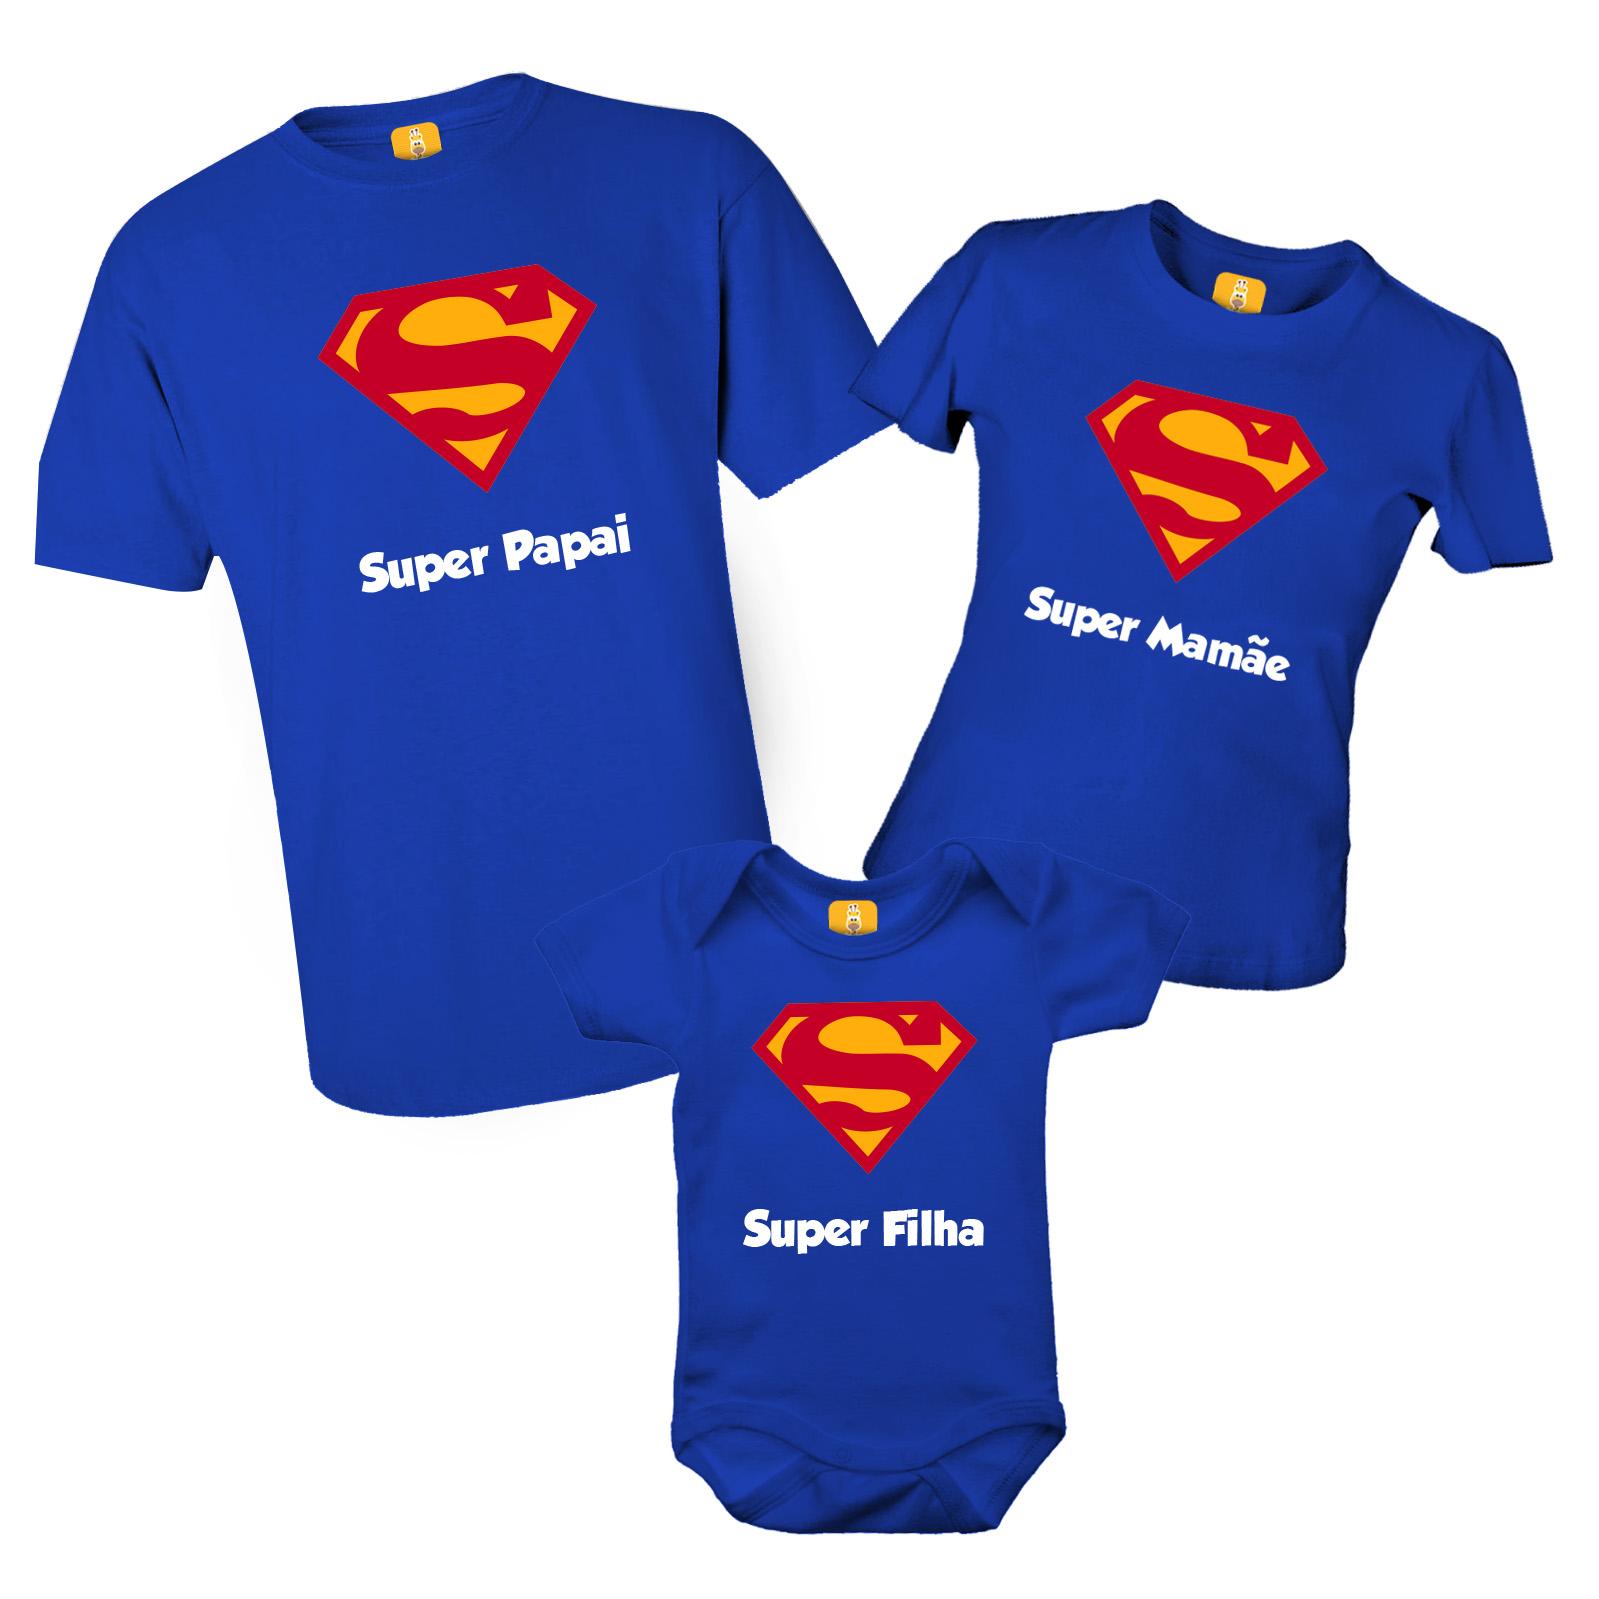 Kit de camisetas do Superman